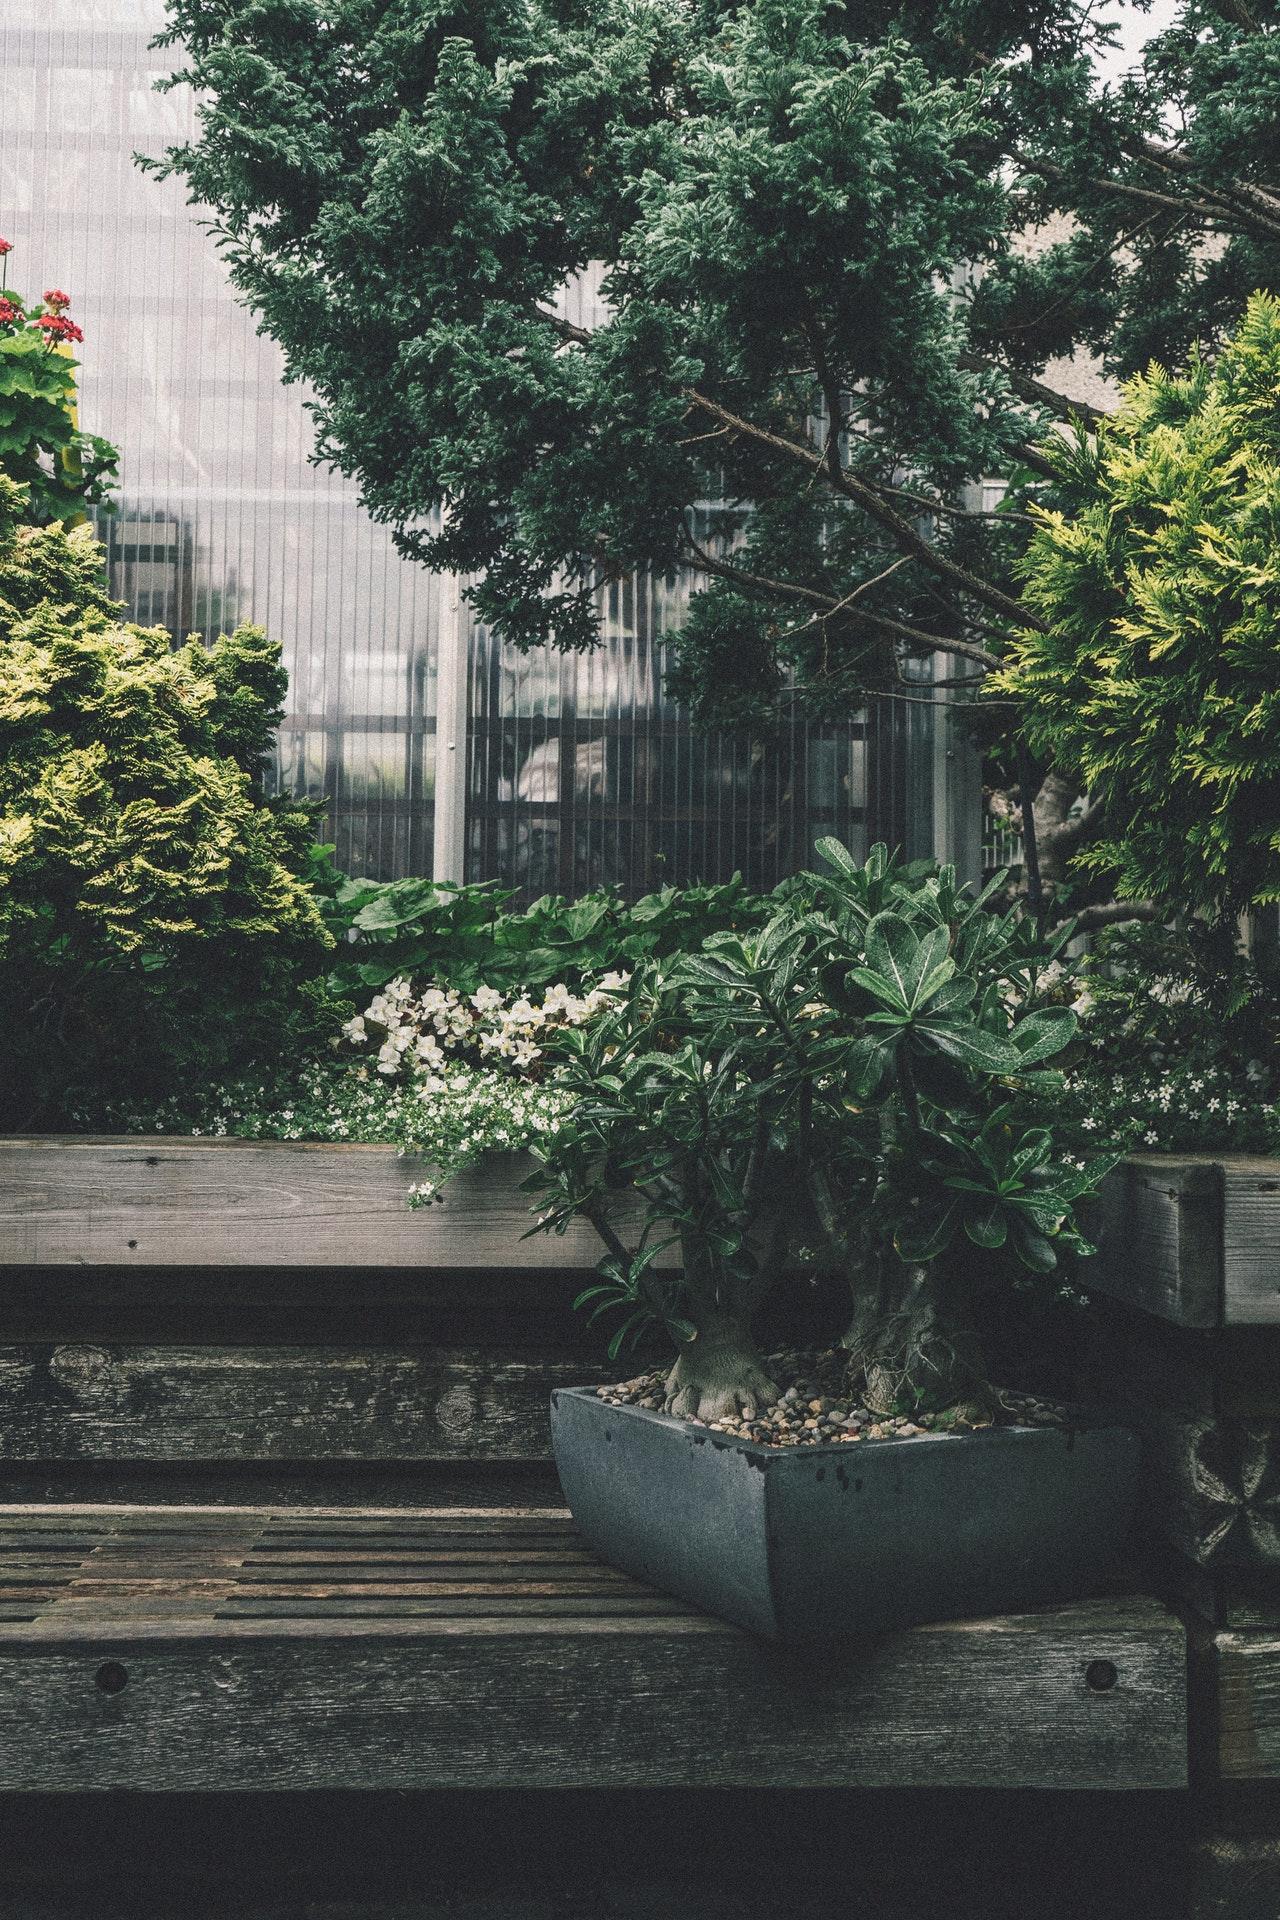 sos : mon bonsaï ficus perd ses feuilles ! - avant gardening